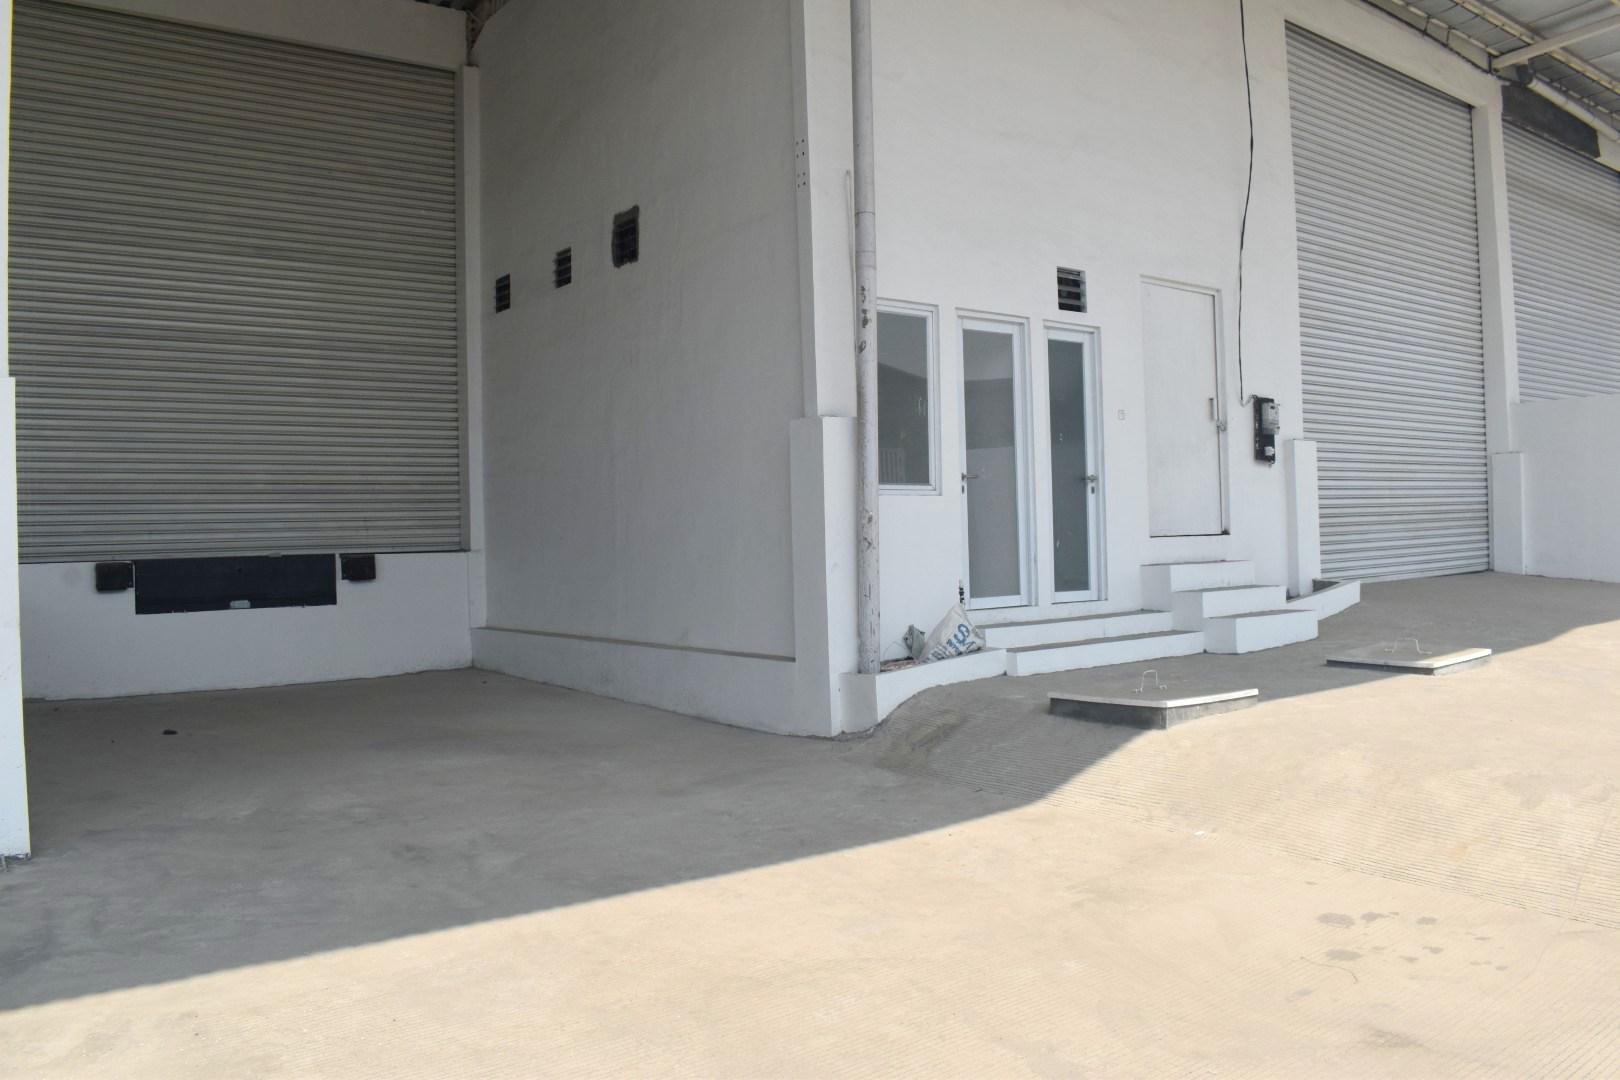 Sewa Gudang Baru Loading Dock Kawasan Industri Delta Silicon Cikarang - 2